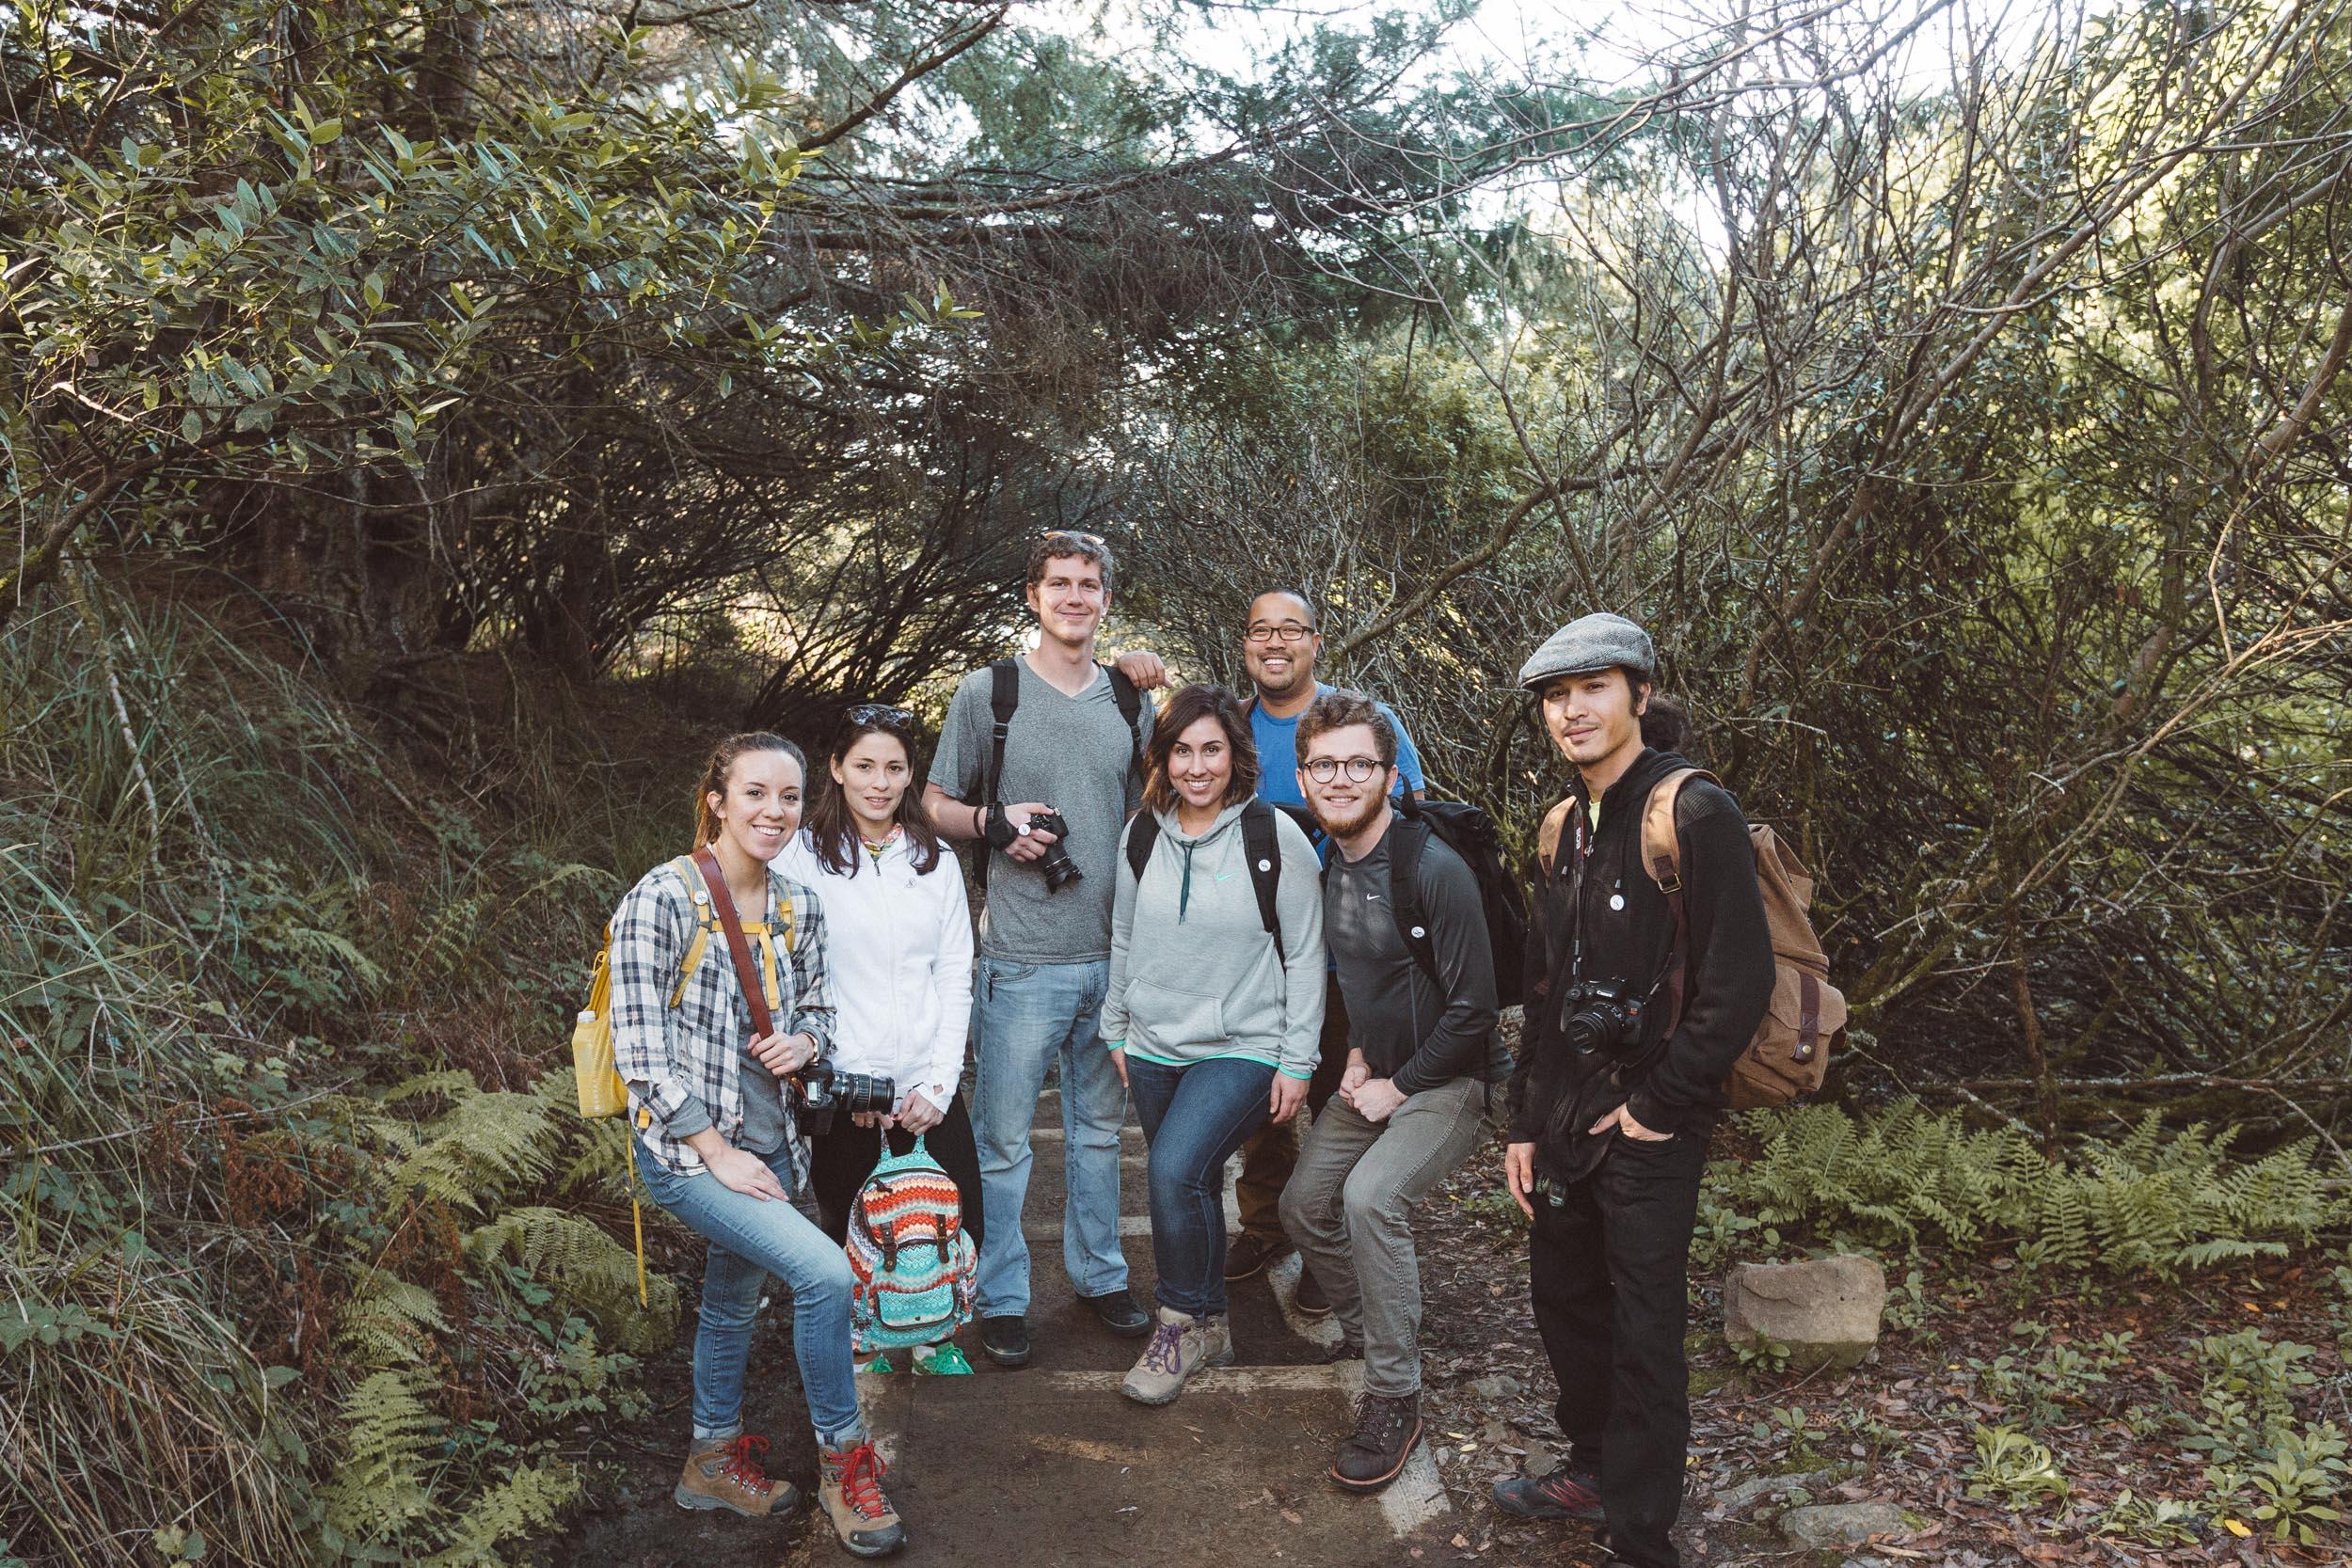 north-coast-adventure-hike-and-shoot-group-1.jpg